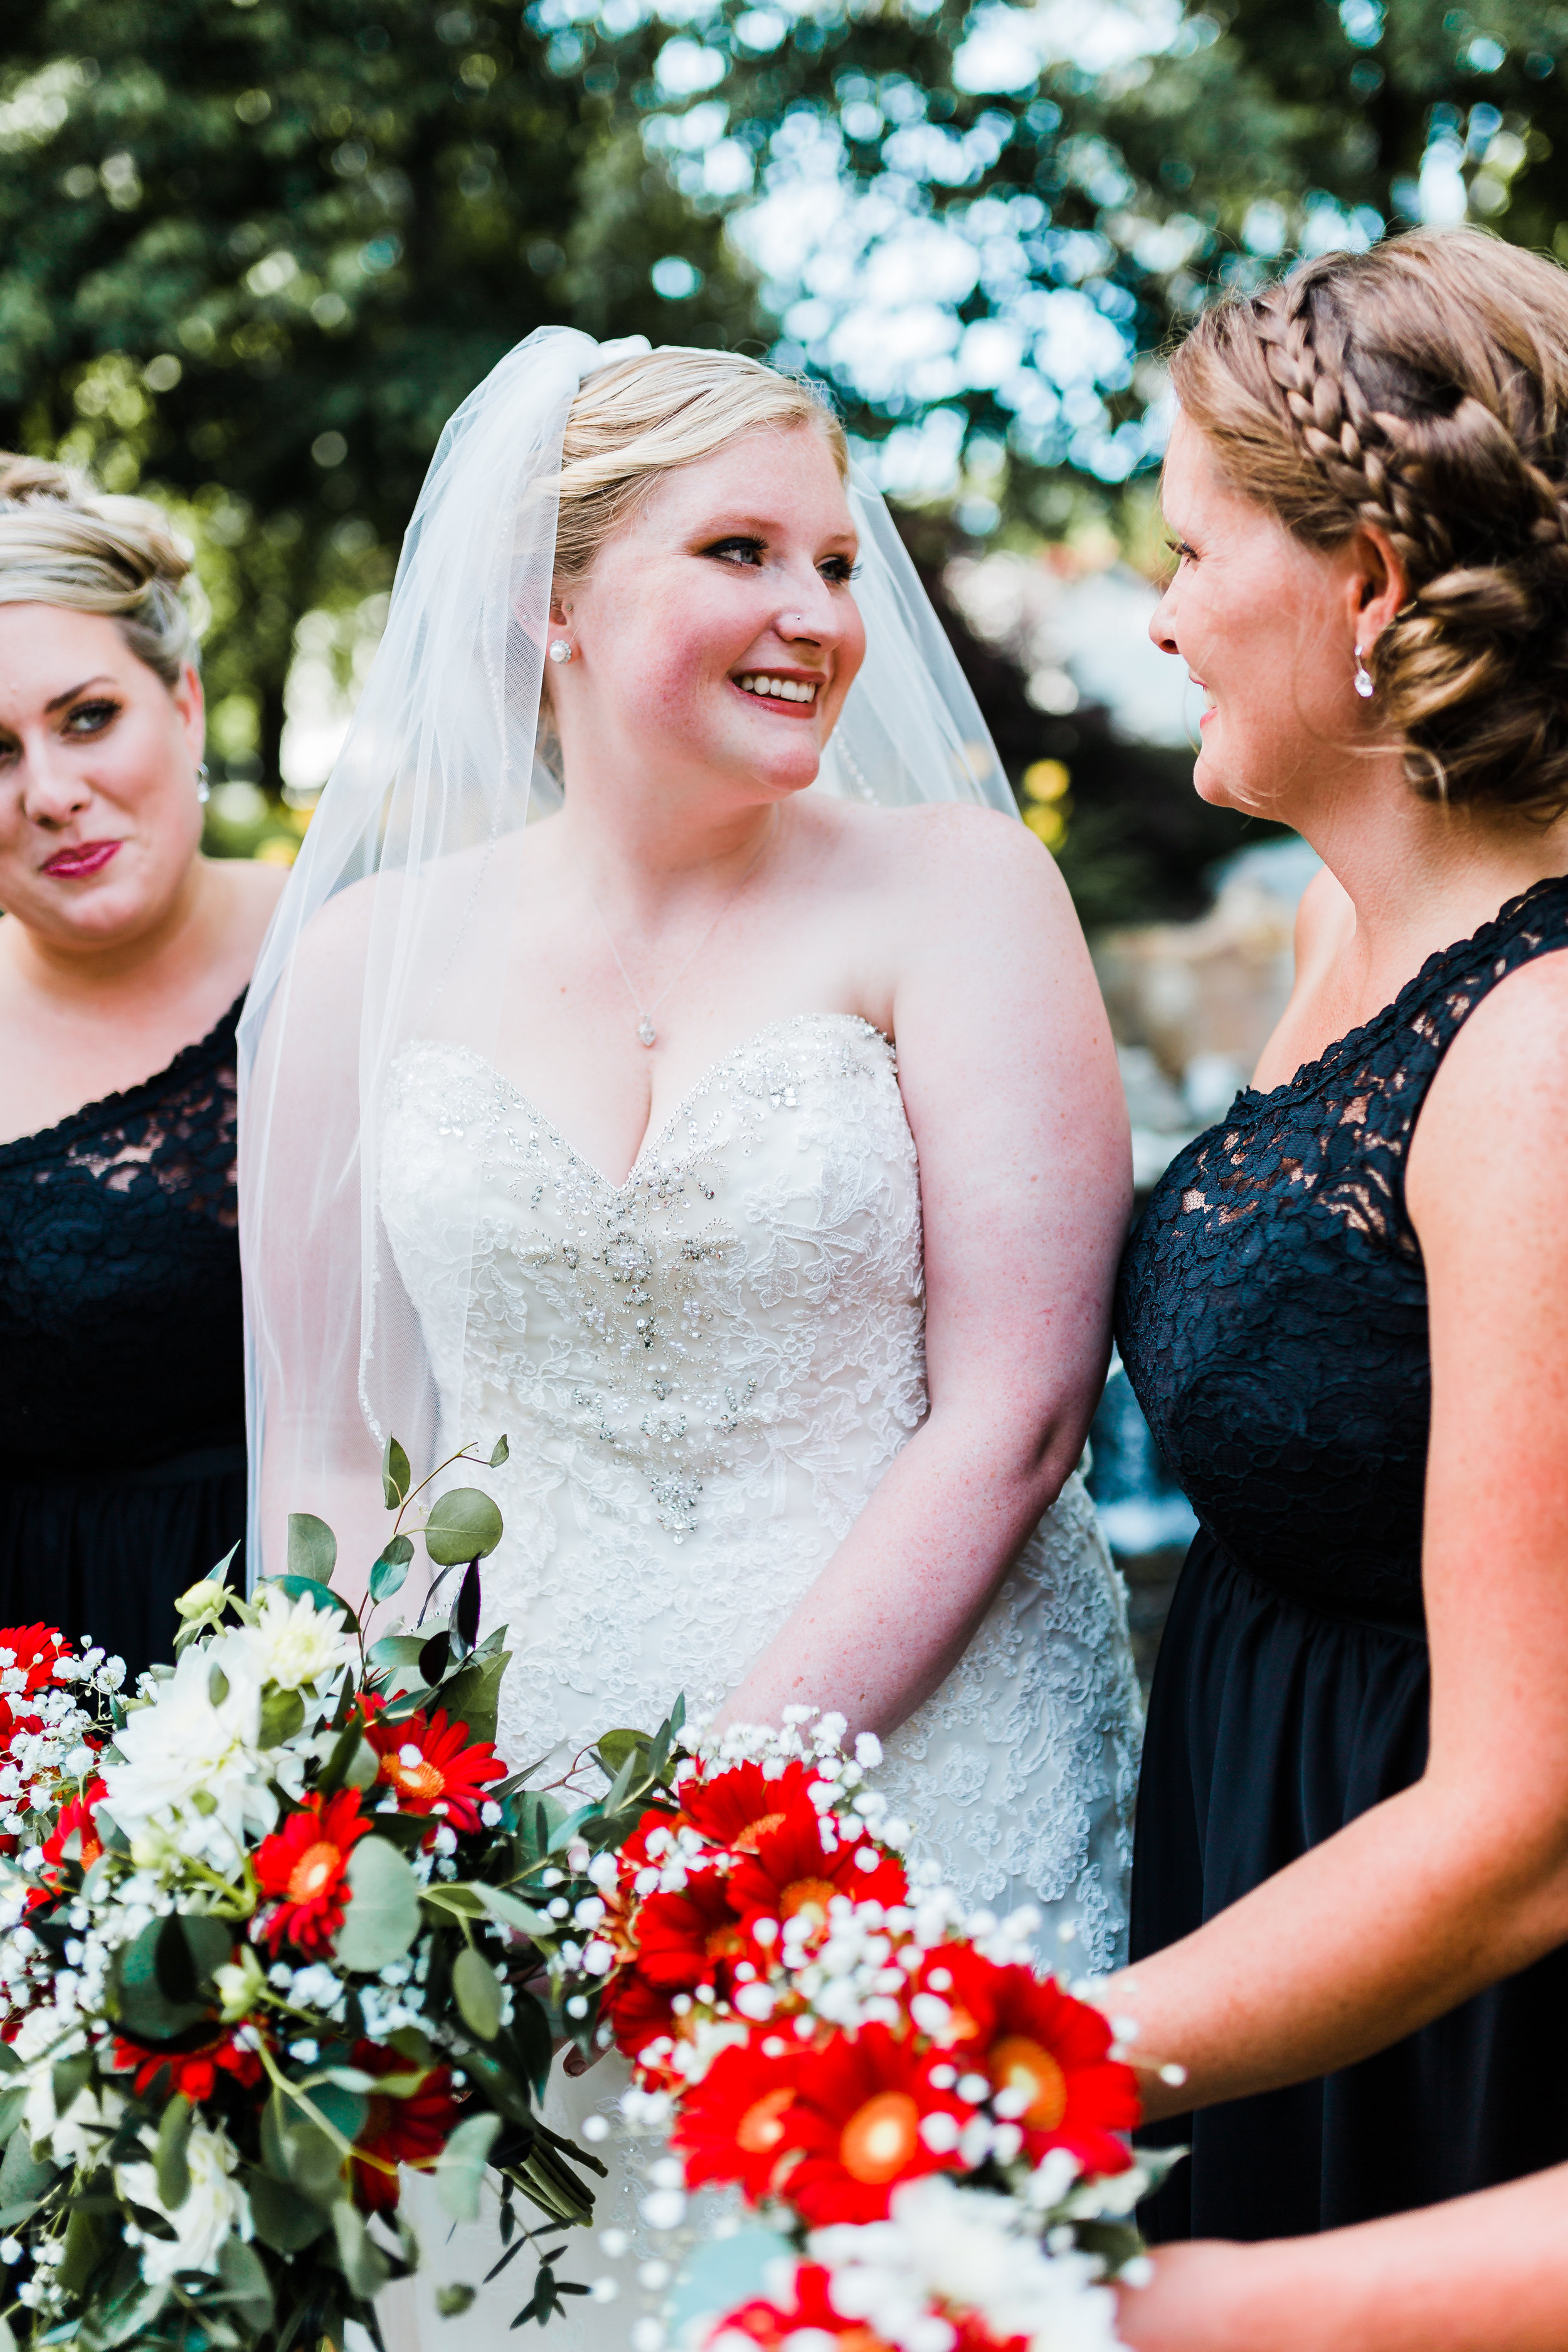 disney bride smiling on her wedding day - disney wedding inspo - maryland wedding photographer - pasadena, md - kurtz's beach weddings